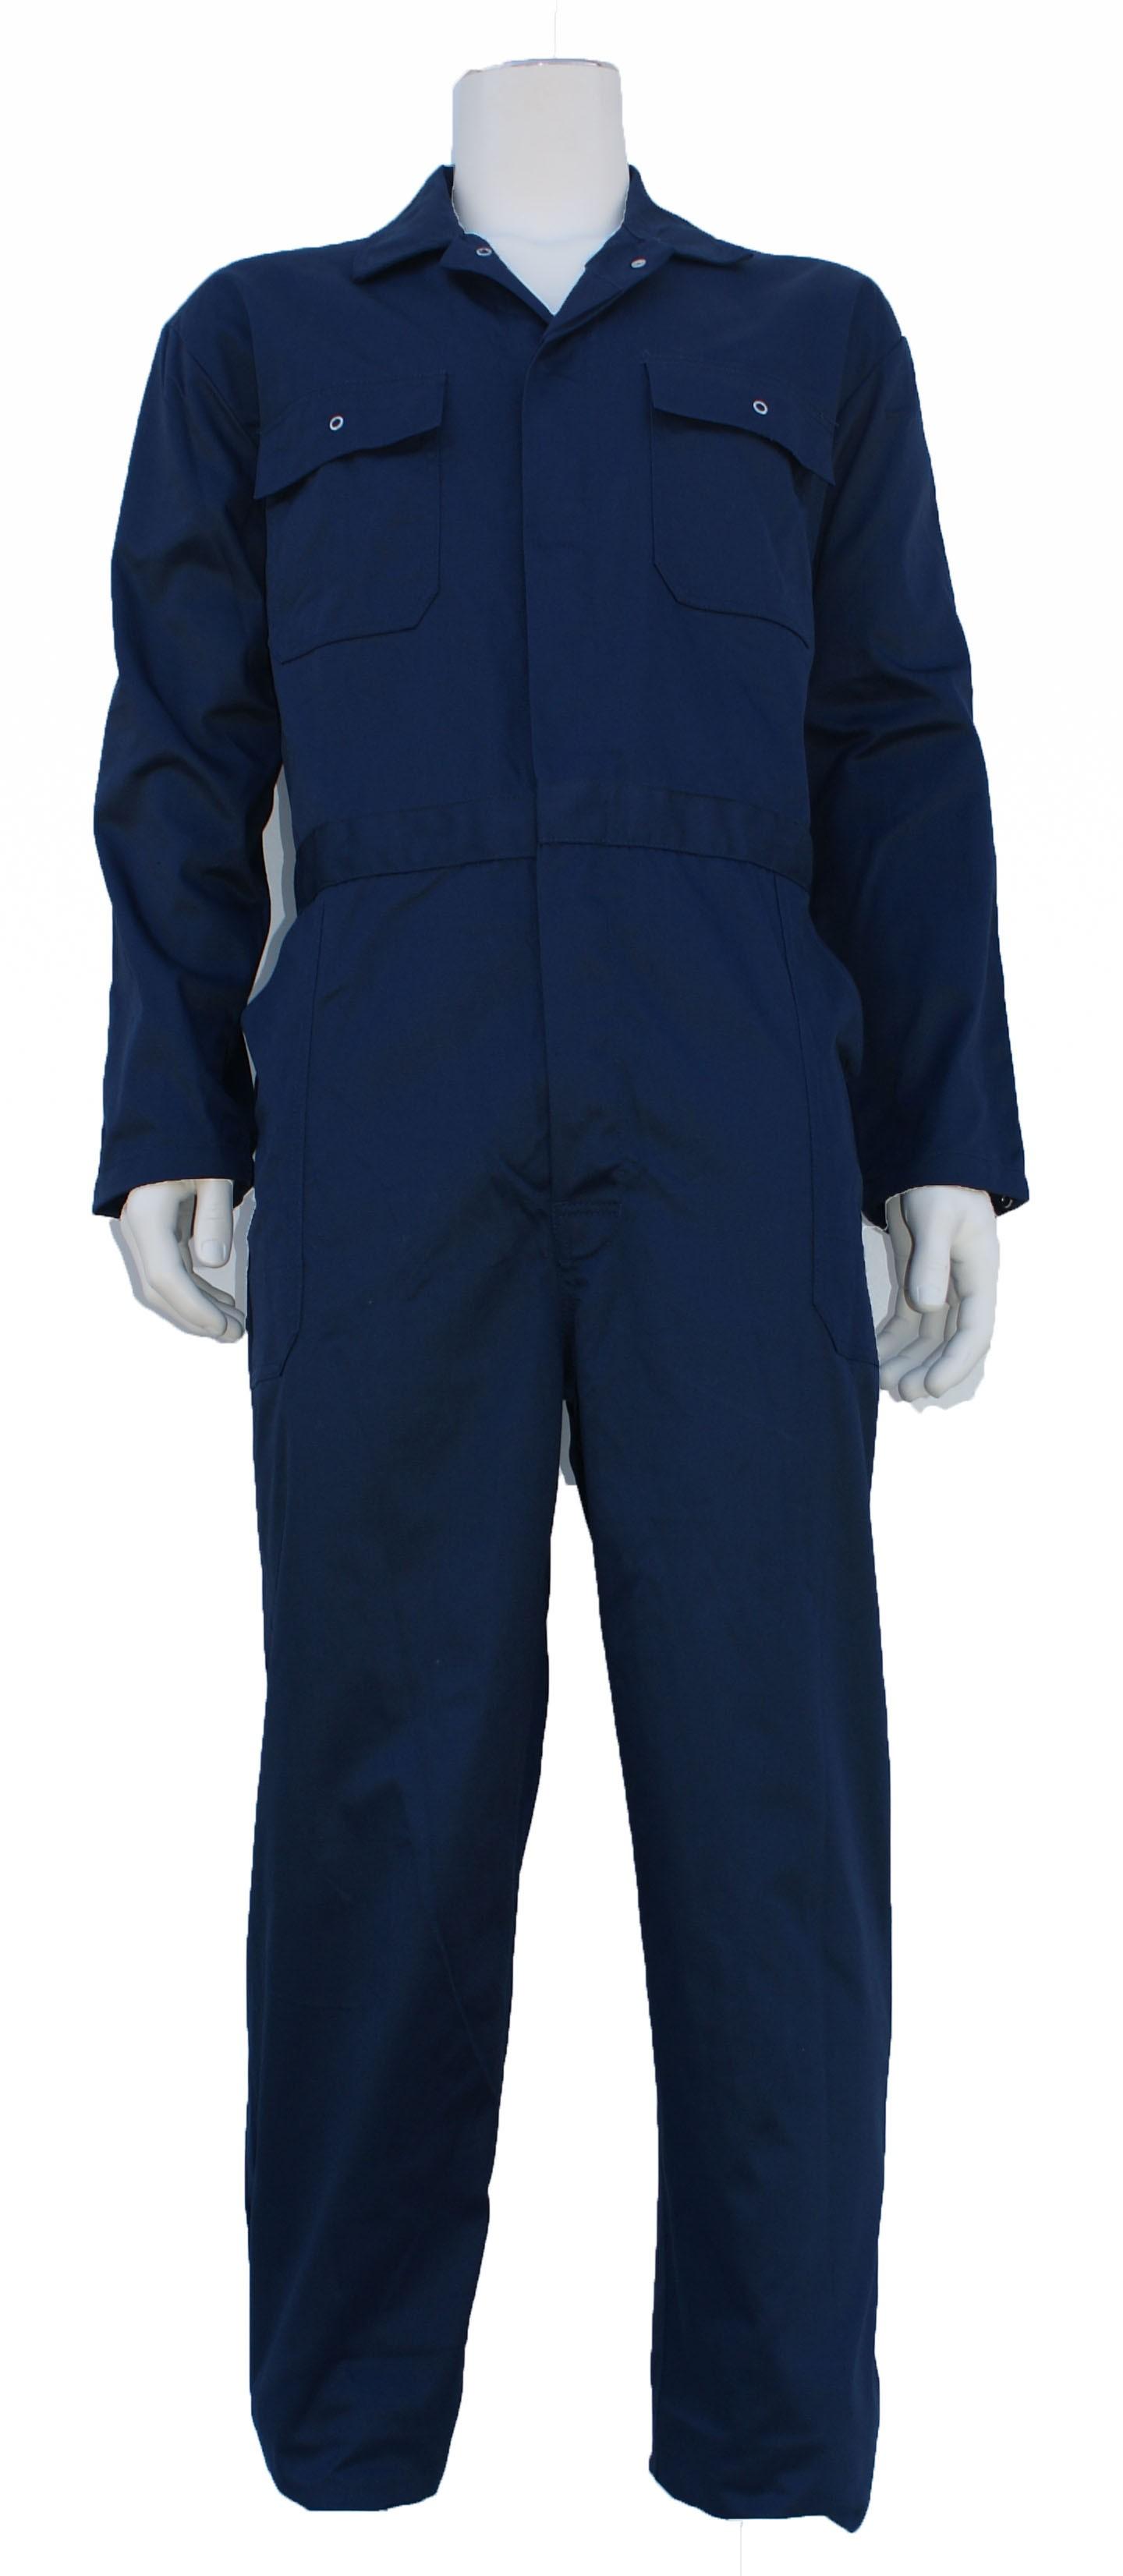 Bestex Kinder overall polyester katoen Navy